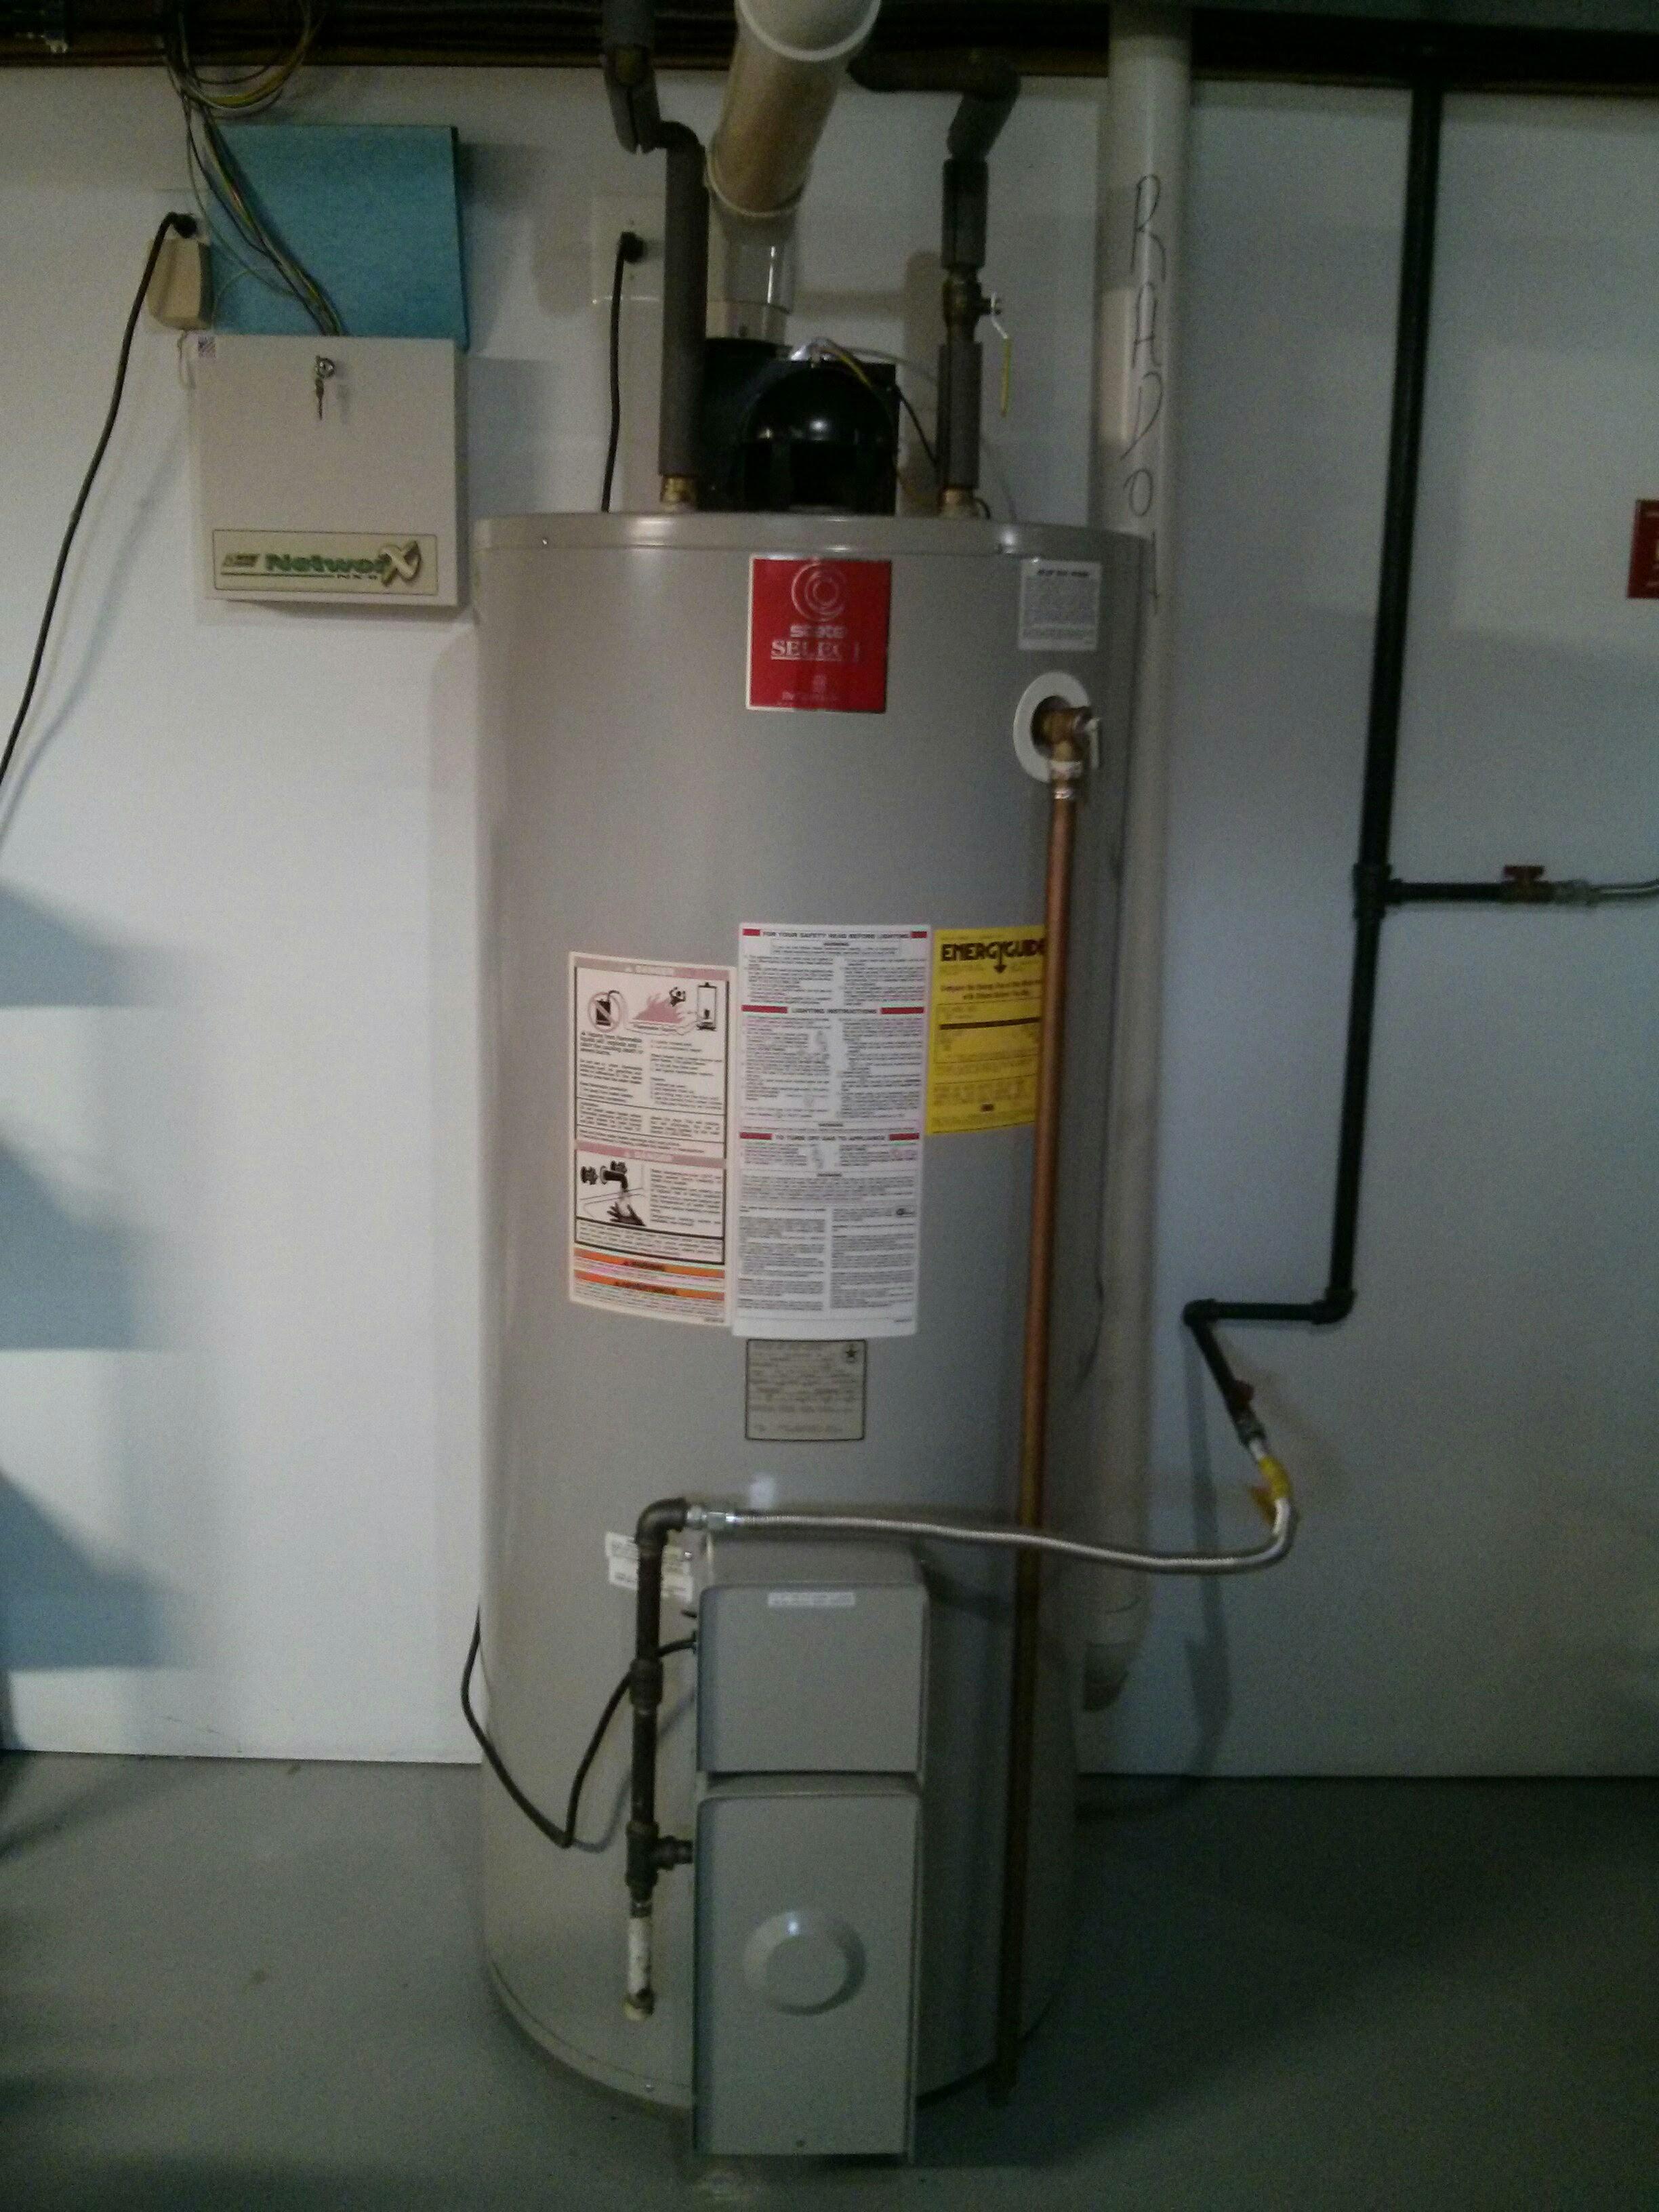 Hot Water Heater Problems >> Water Heater Power Vent Blower Motor Snubber Retrofit